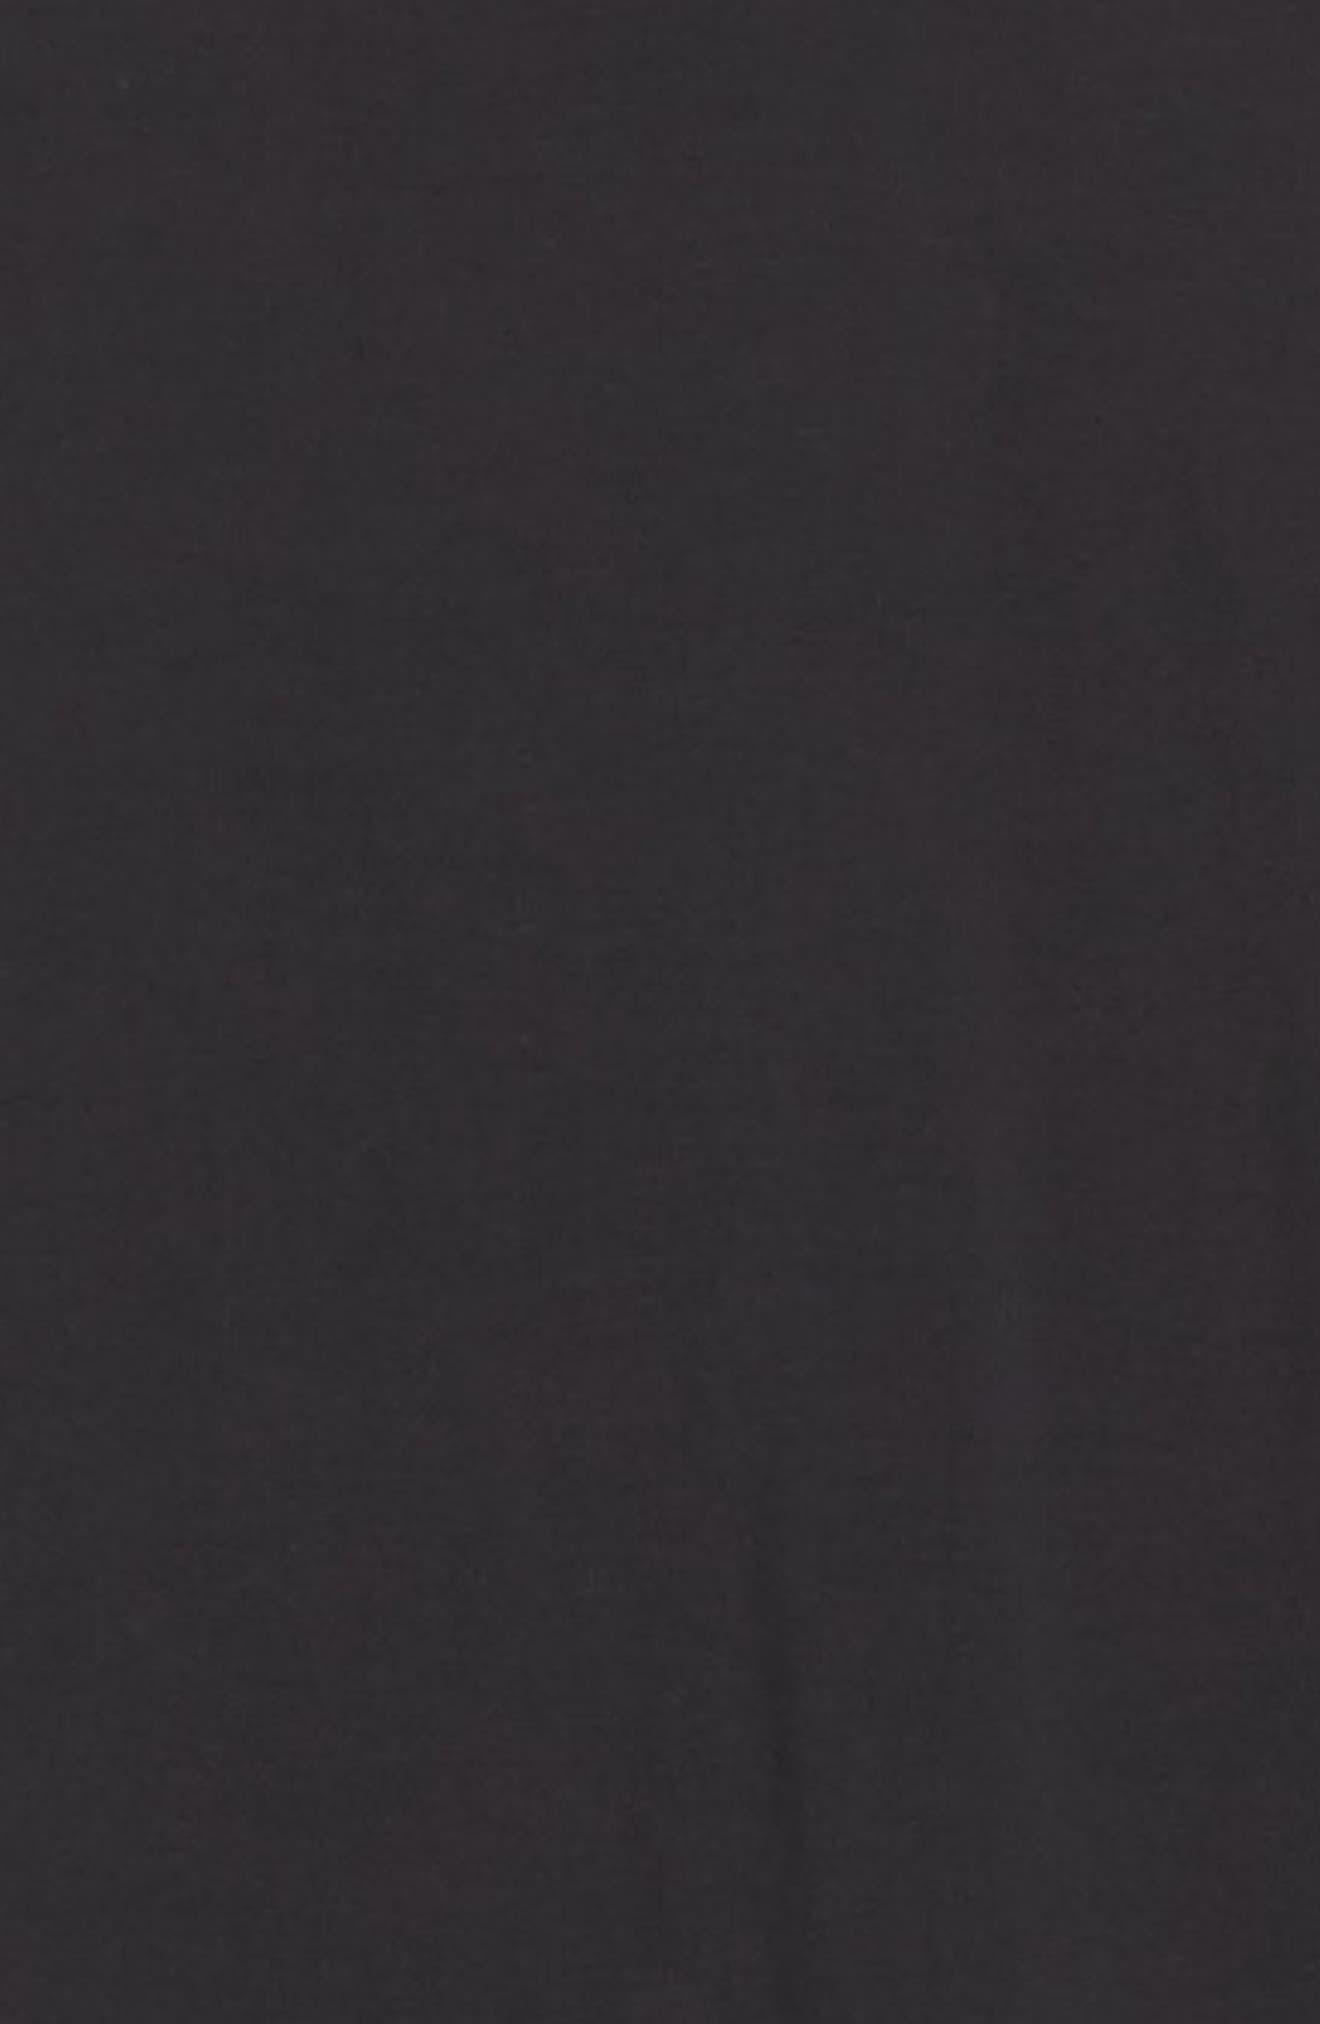 Modal Pajamas,                             Alternate thumbnail 5, color,                             BLACK